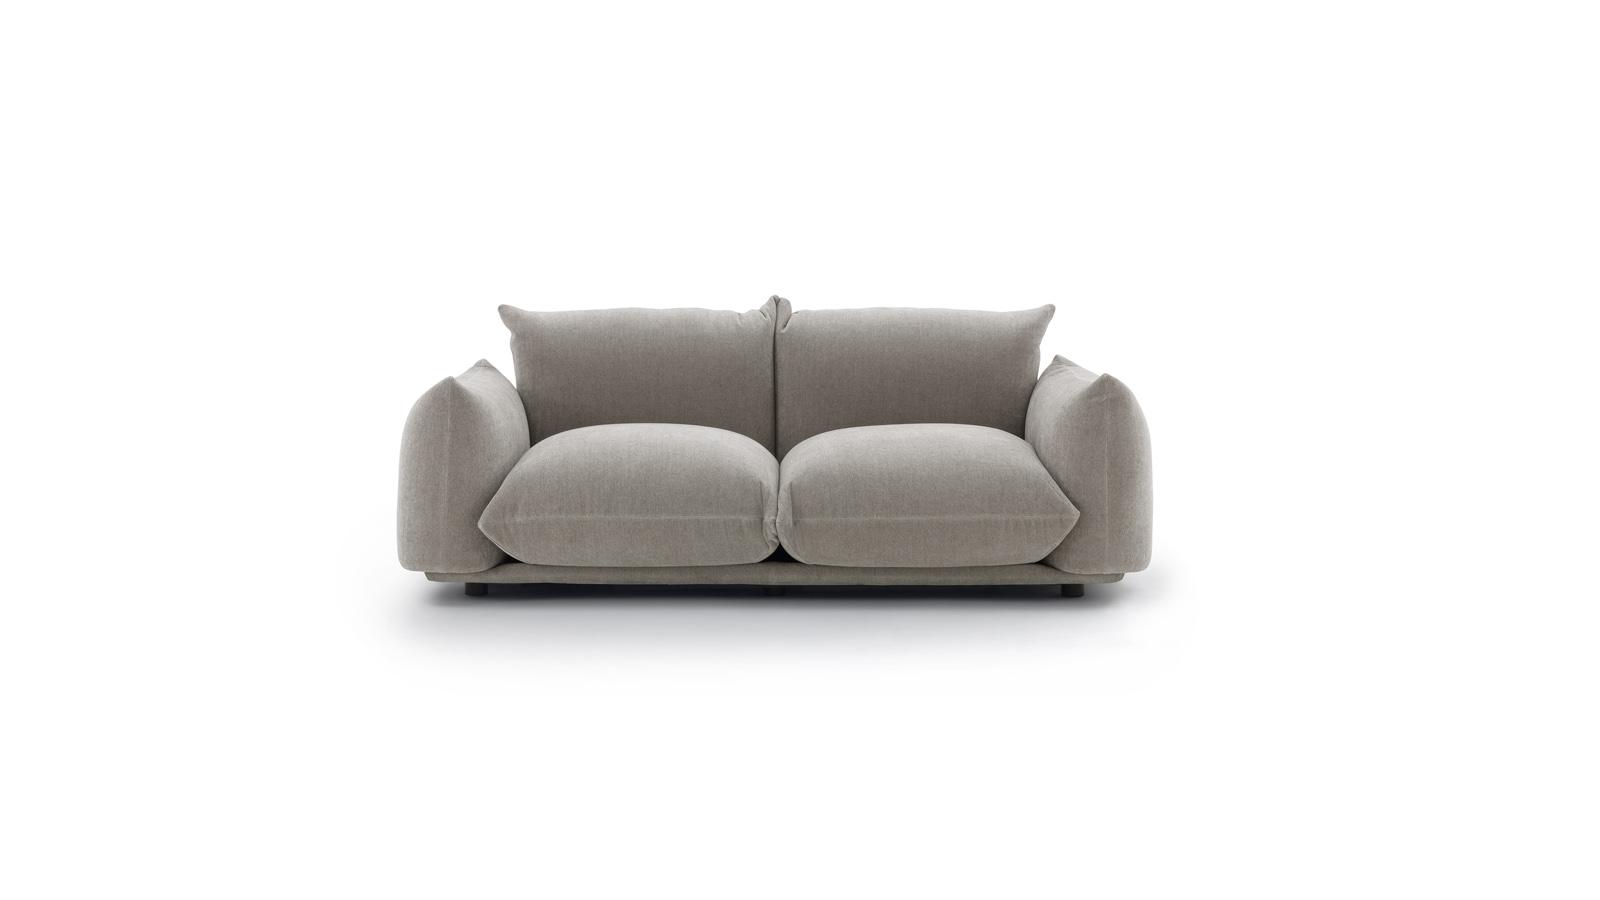 TinnappelMetz-arflex-marenco-sofa-11